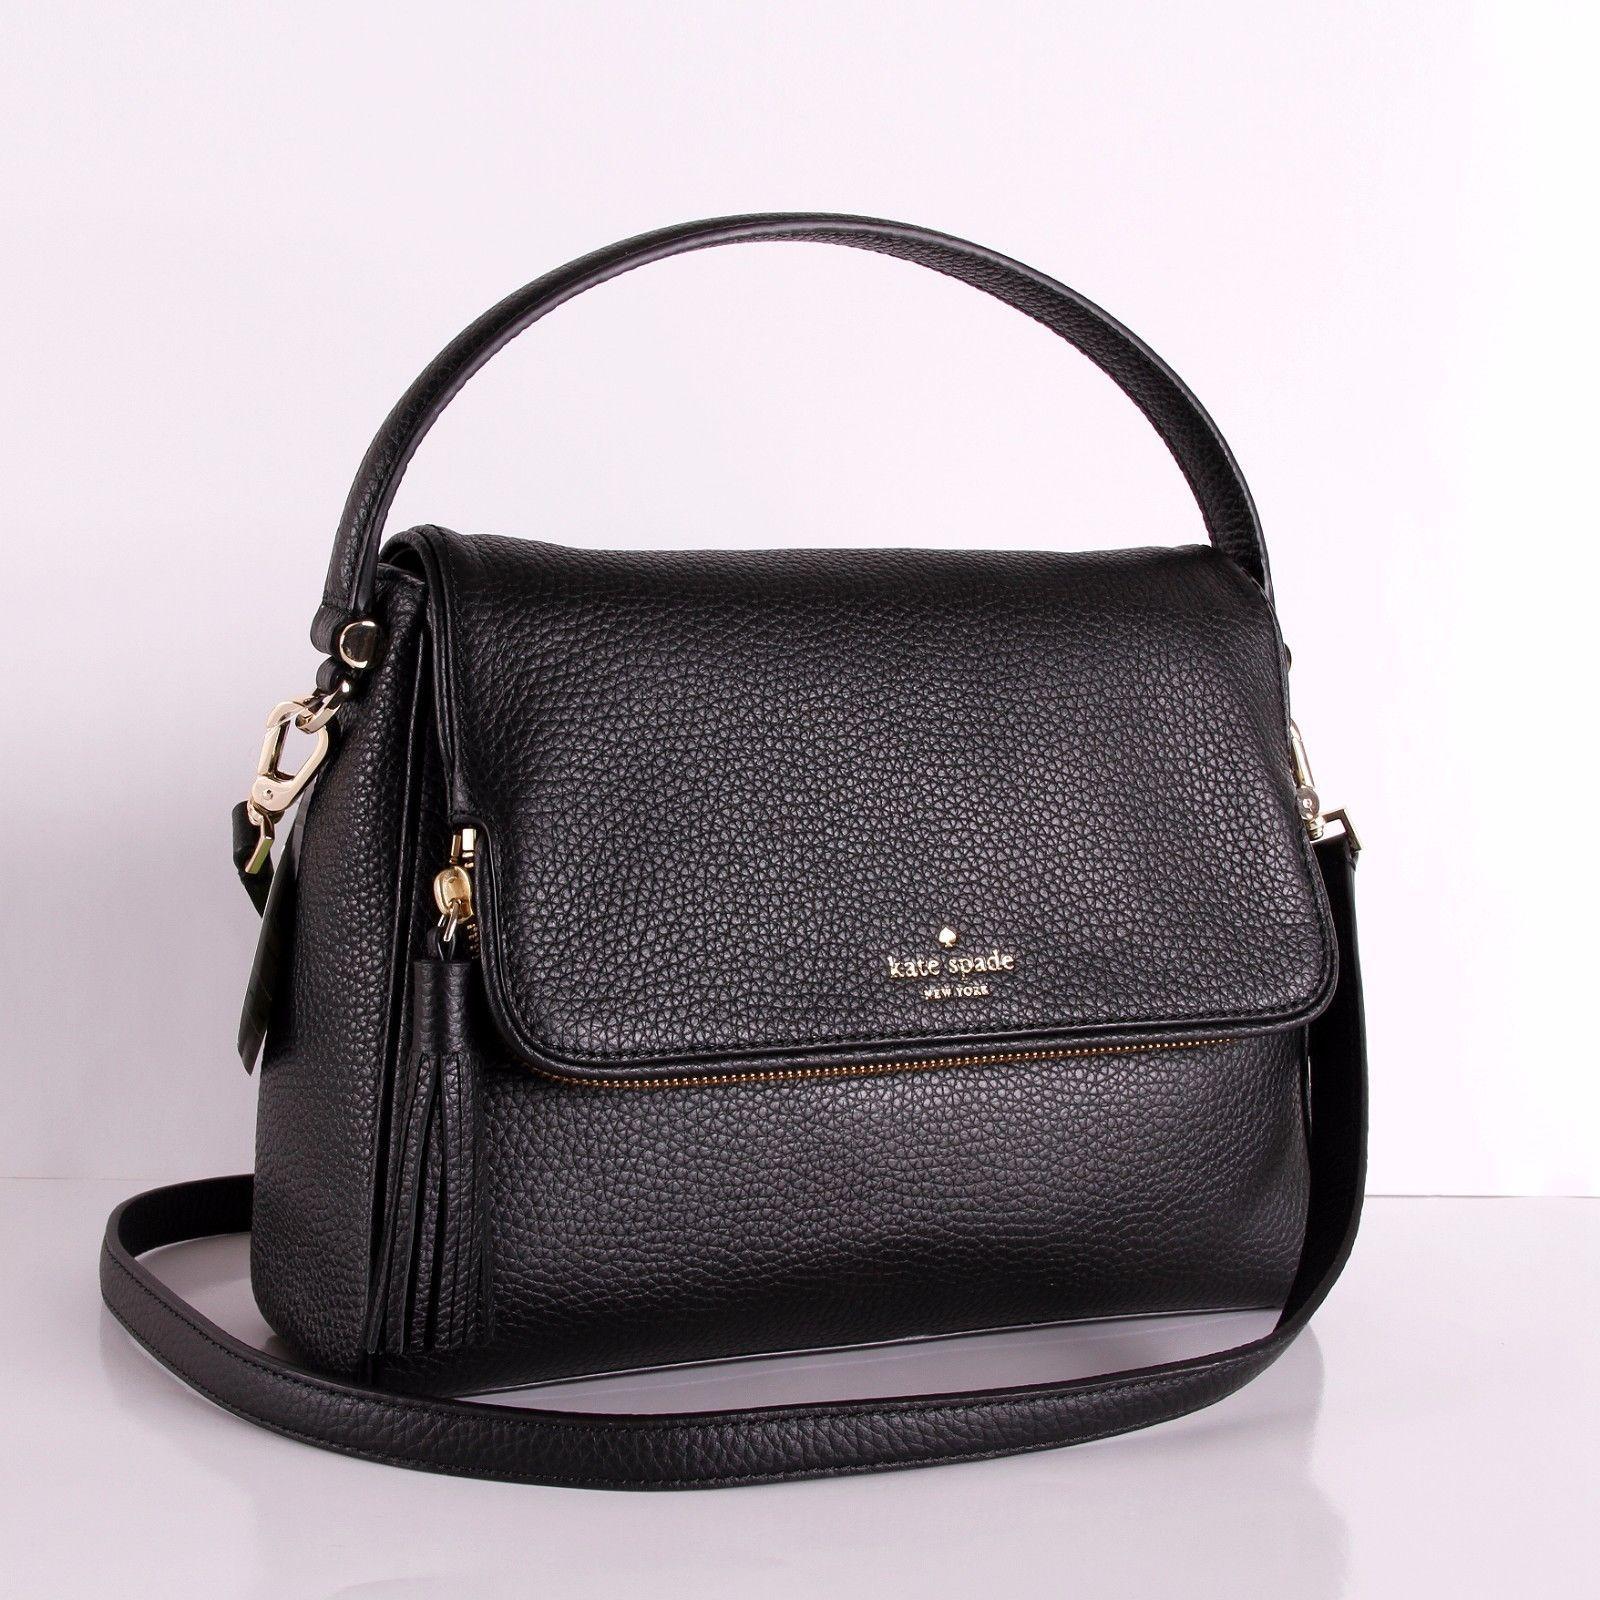 NWT Kate Spade Miri Chester Street Black Leather Bag Handbag Crossbody WKRU4076